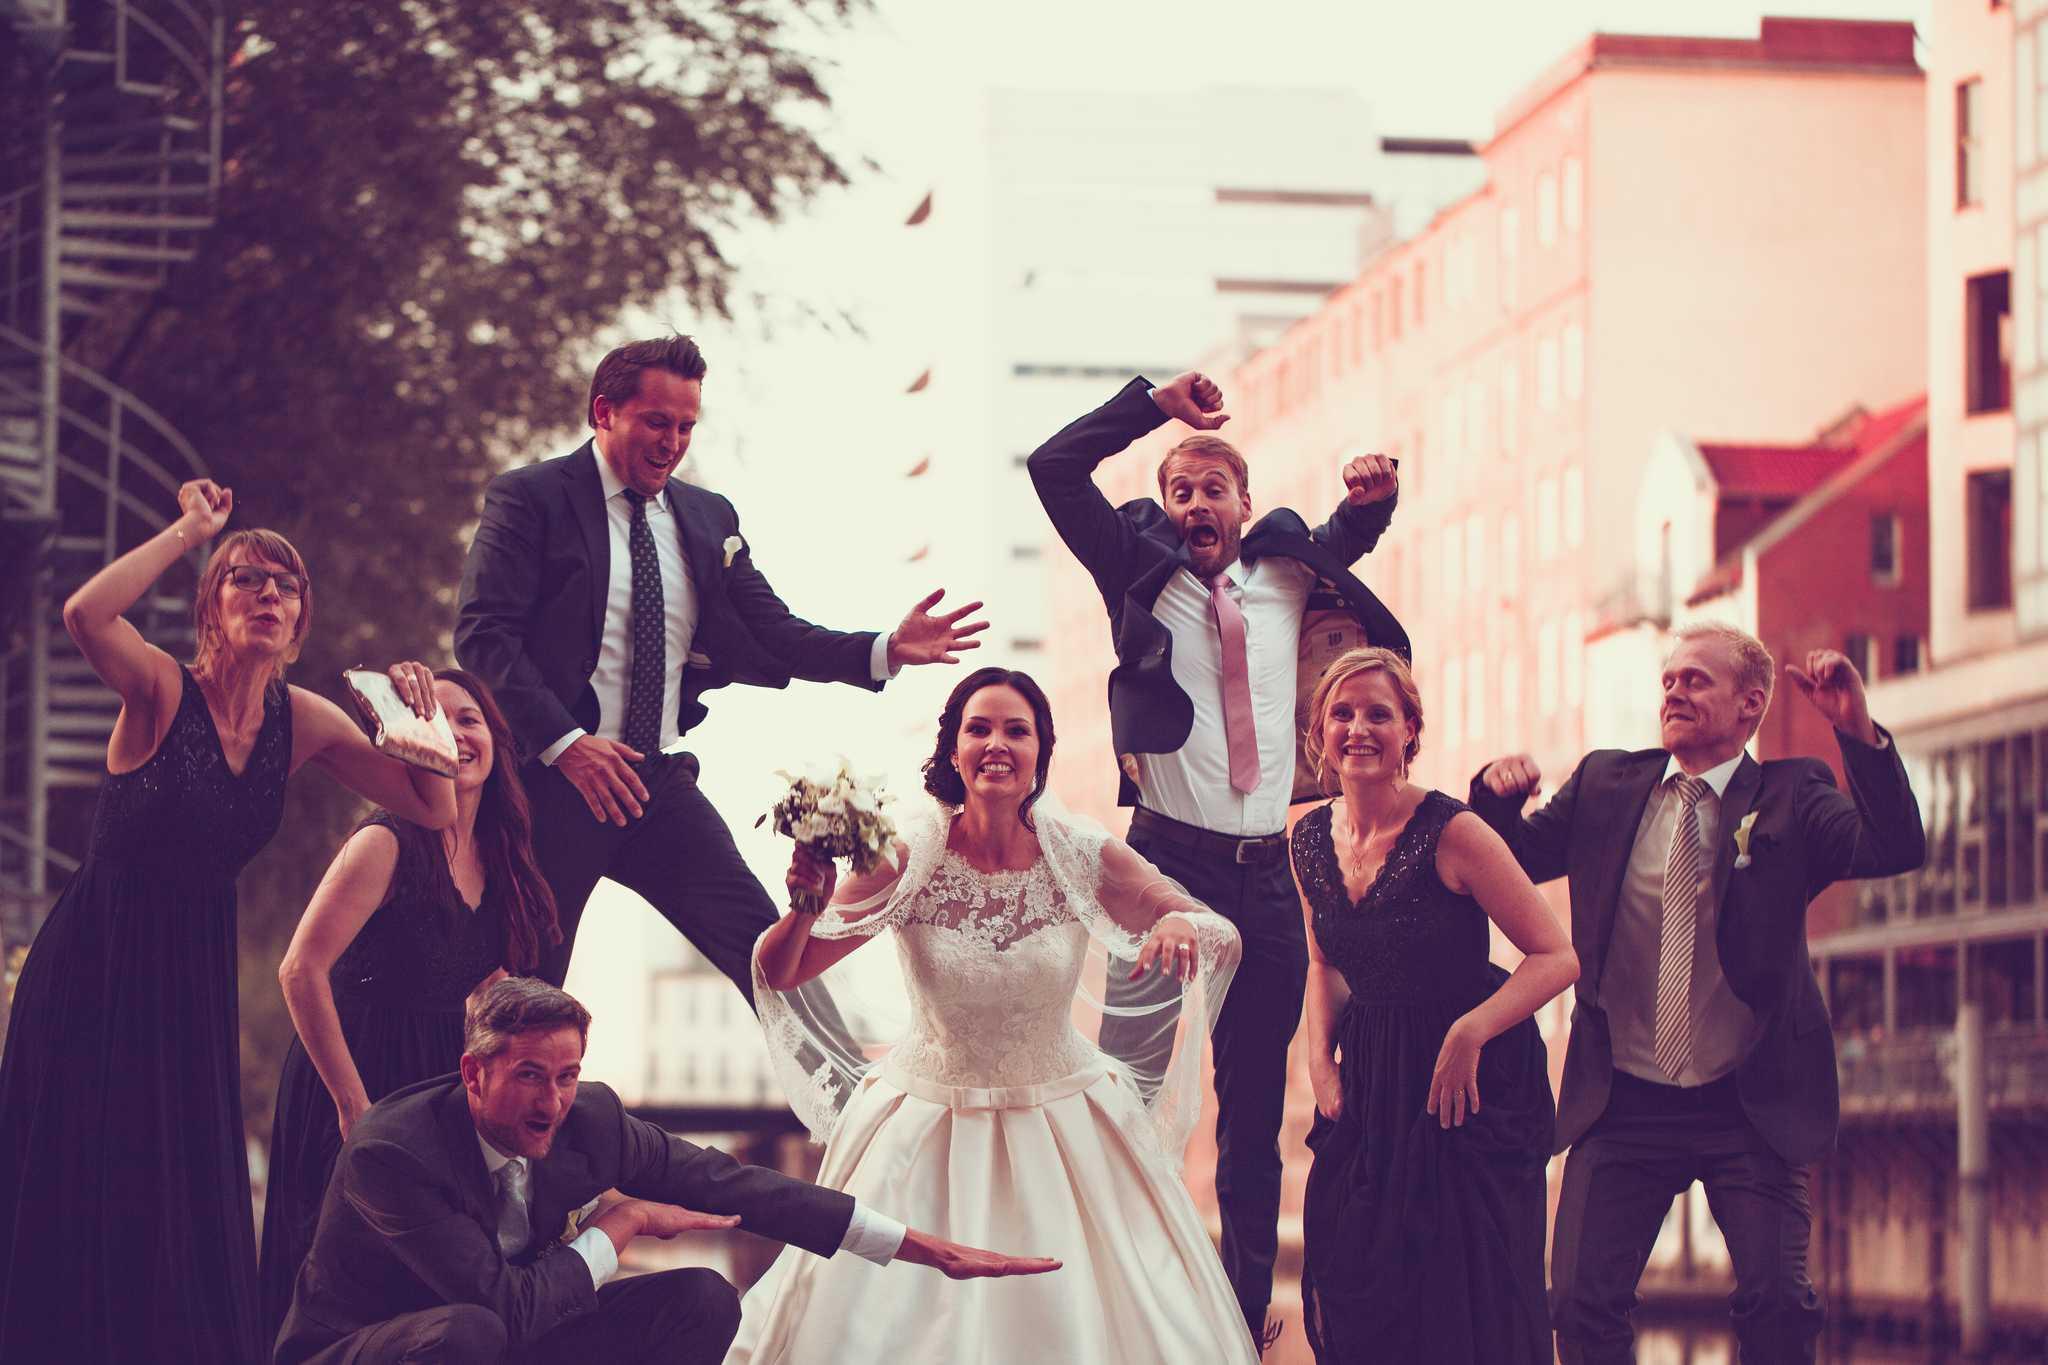 wedding-kaphi23.jpg